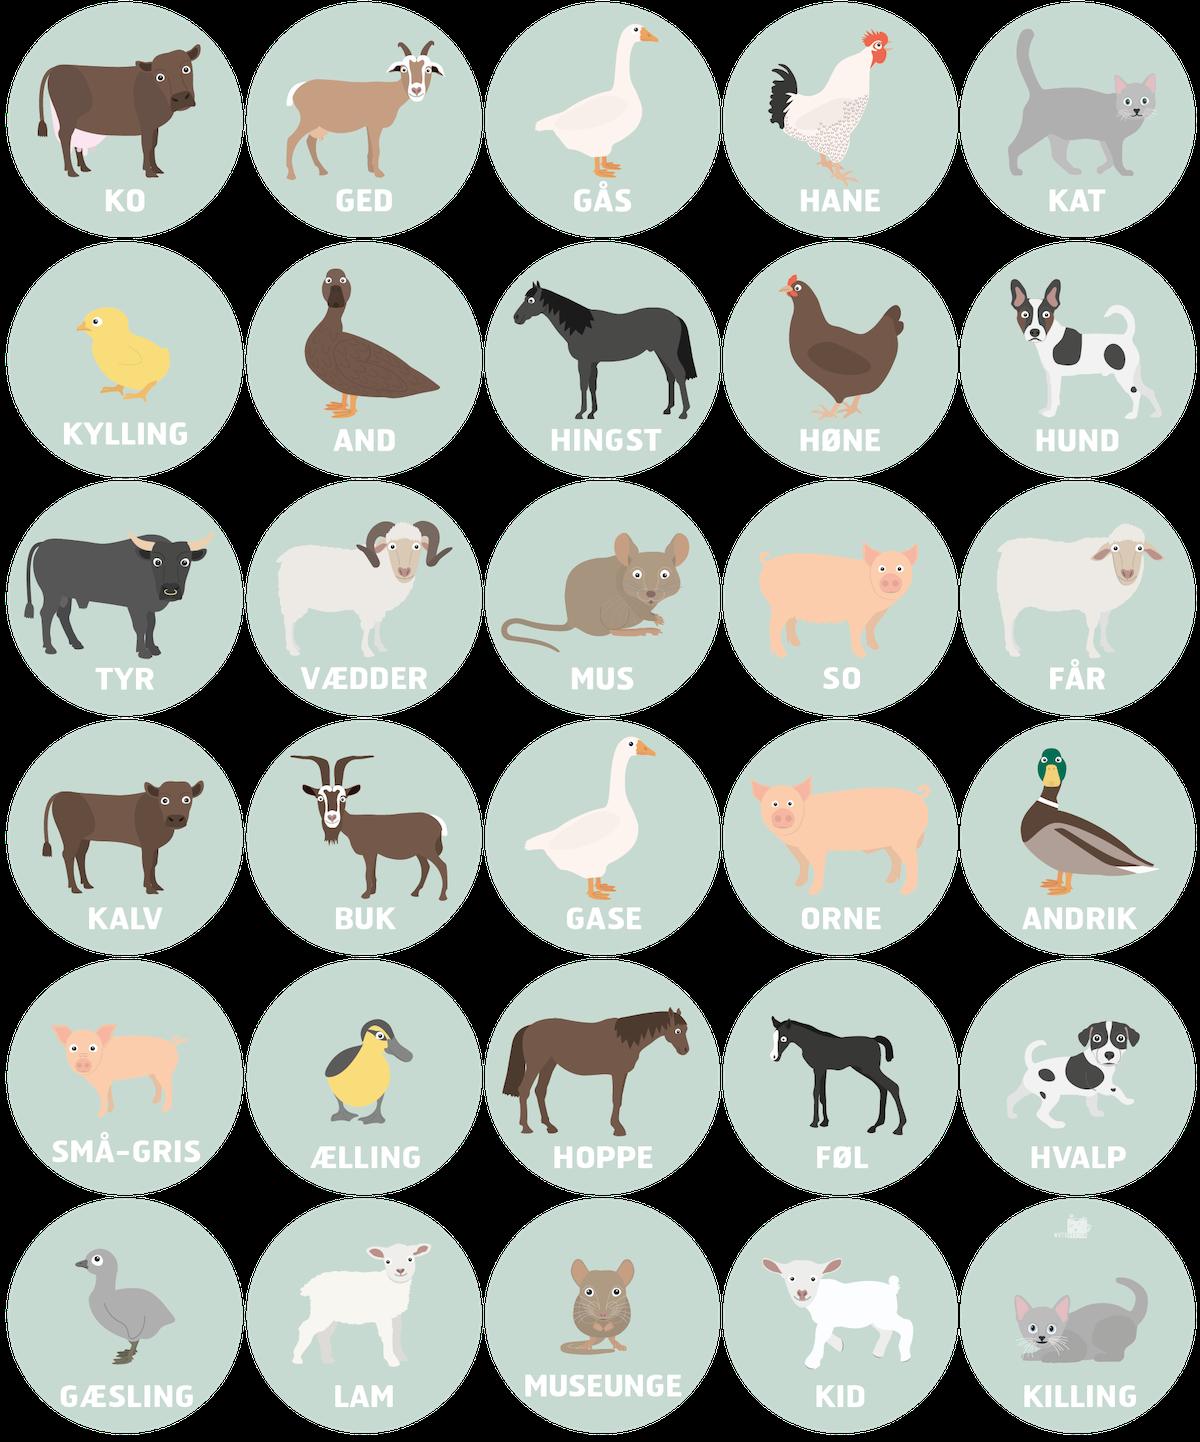 bondegaardsdyr-gulvfolie-gulvklistermaerker-mutedesign-sprogstimulering-sprogudvikling-boerns-tidlige-sprog-tidlig-litteracy-visuelle-laringgsmiljoeer-mutedesign-folie-til-doer-30-stk-oe25